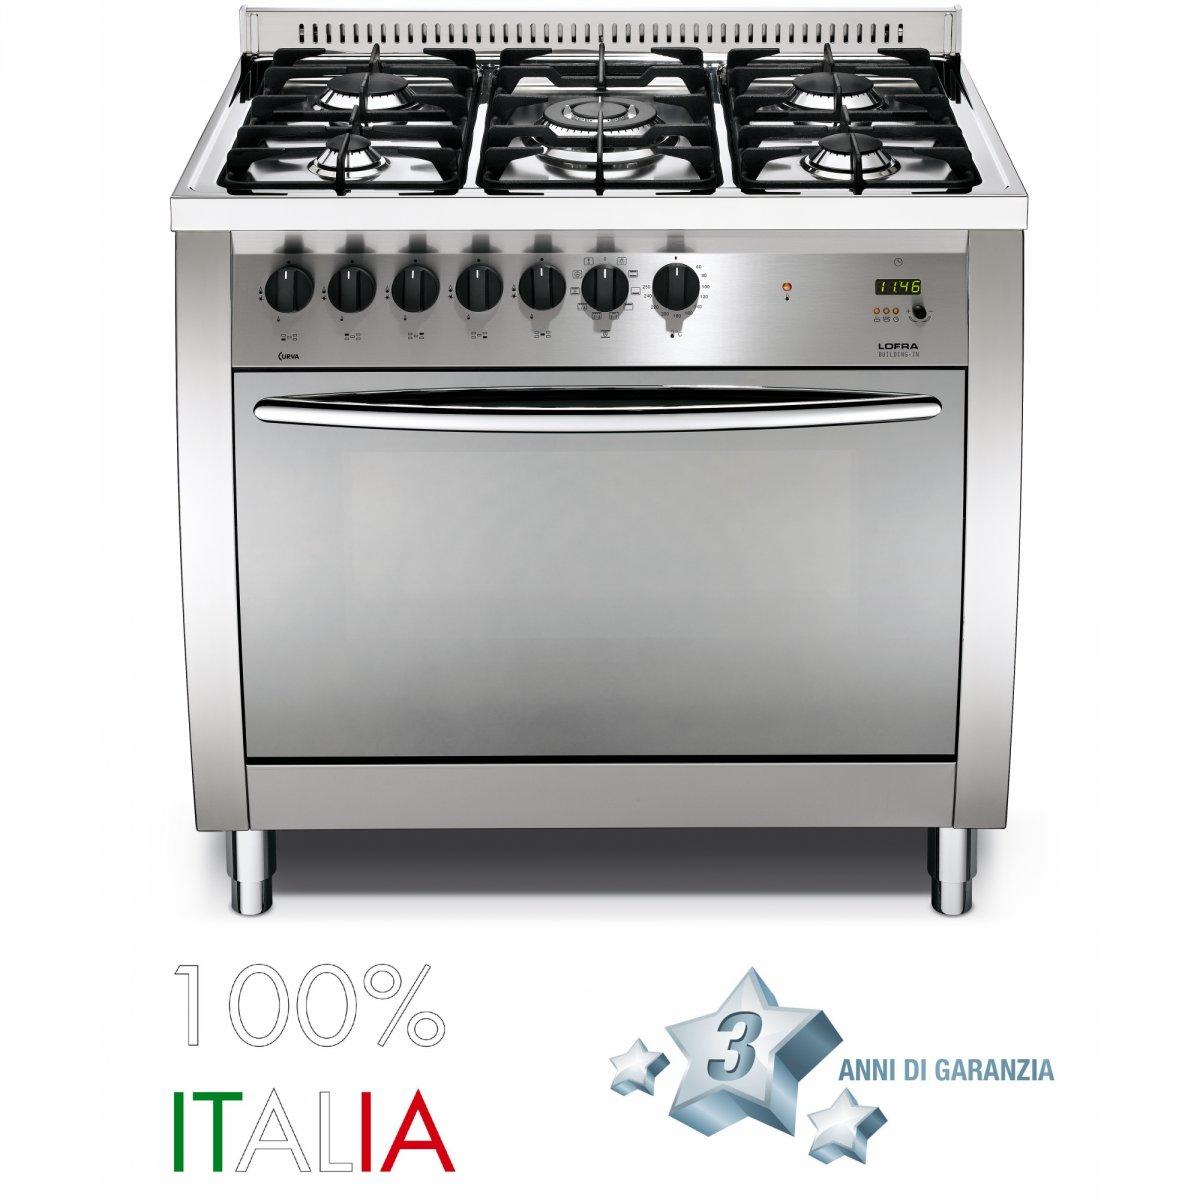 Lofra cucina curva 90 inox forno gas cg96gvc lofra elettrodomestici cucine - Elettrodomestici cucina a gas ...